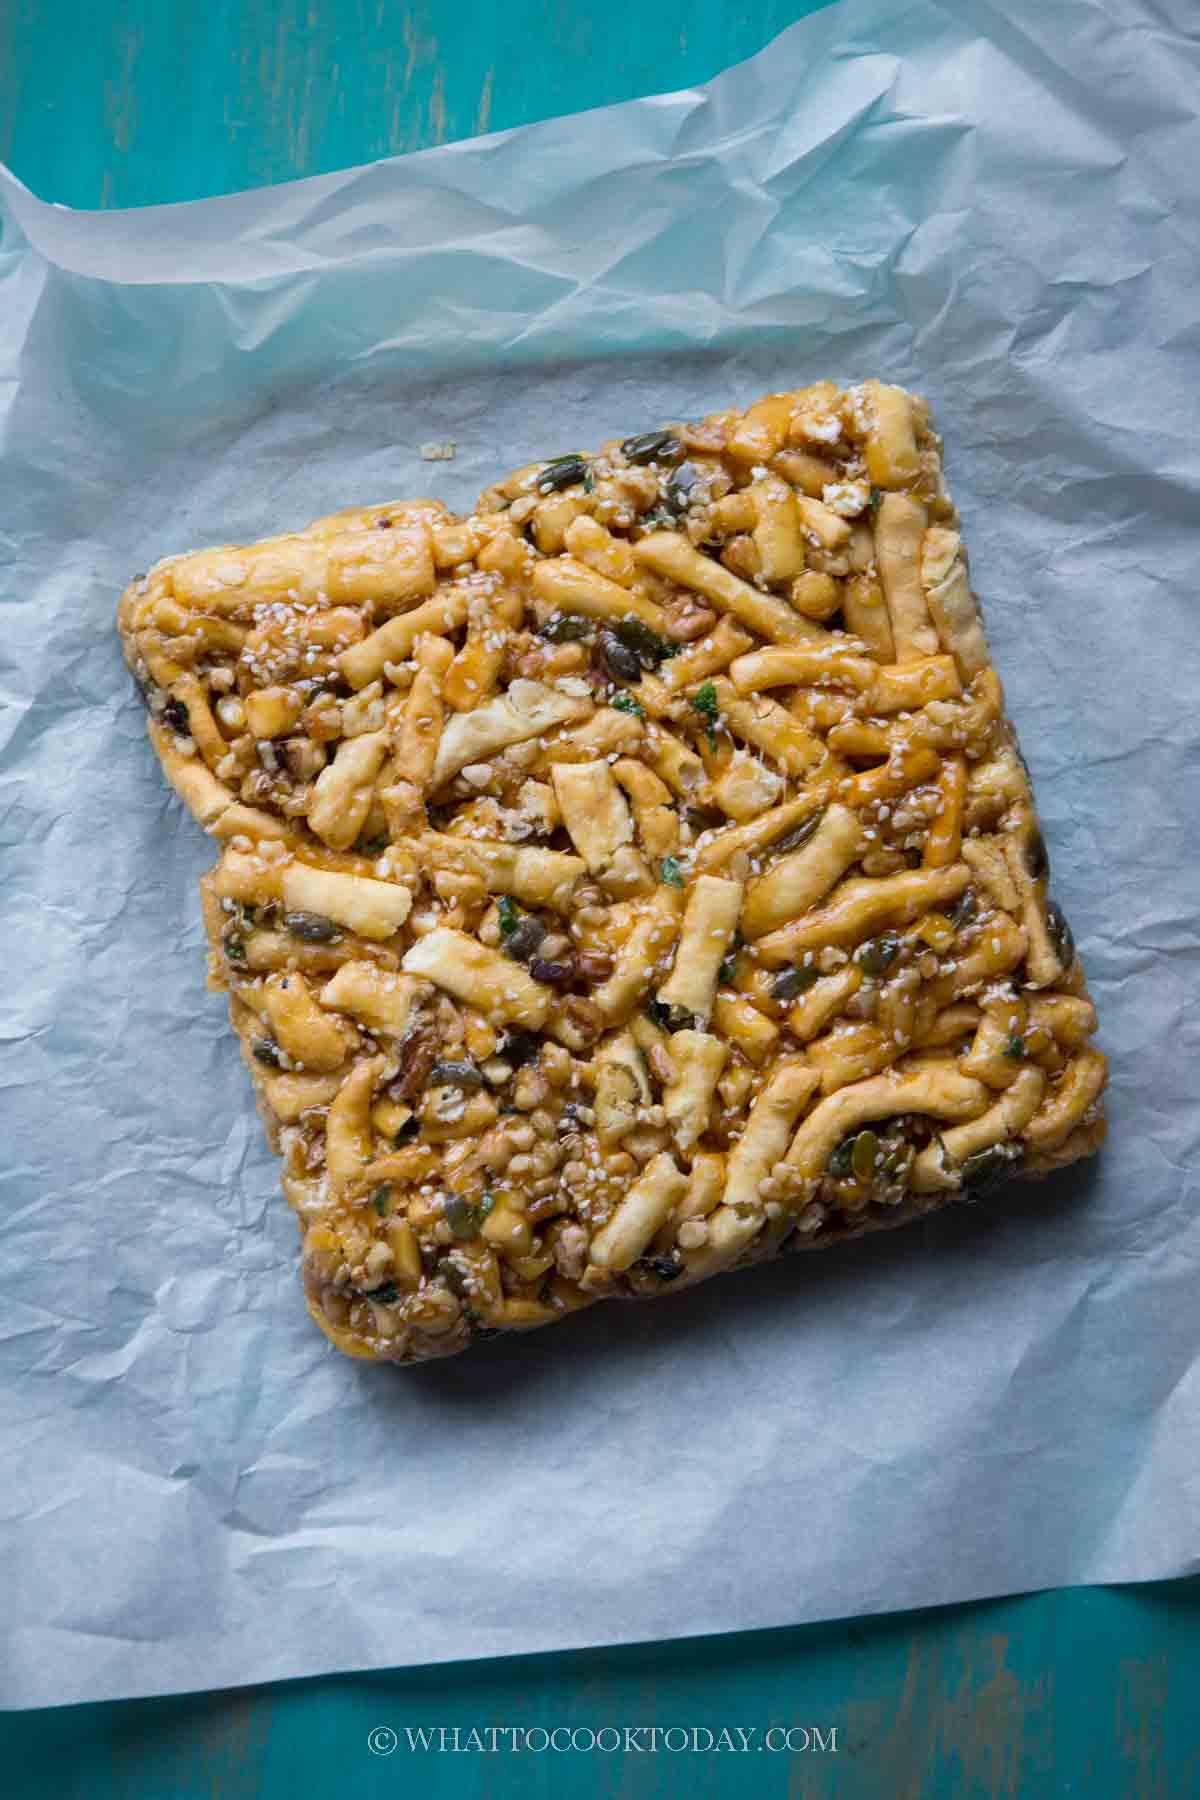 Easy Sachima (Shaqima / Chinese Soft Flour Cake)